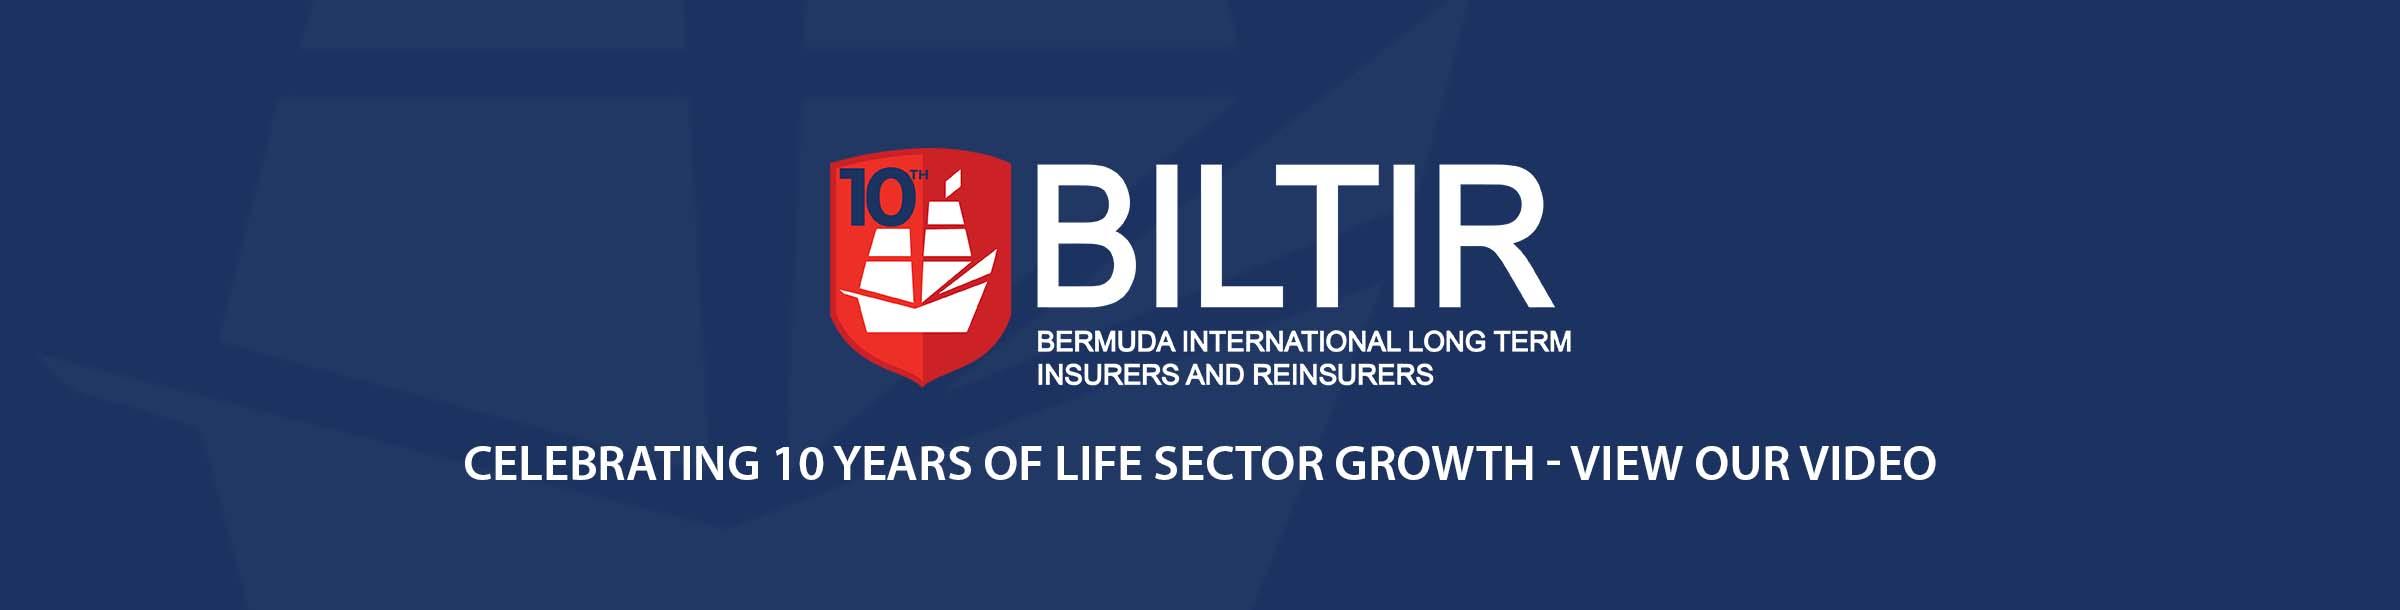 biltir-timeline-3a